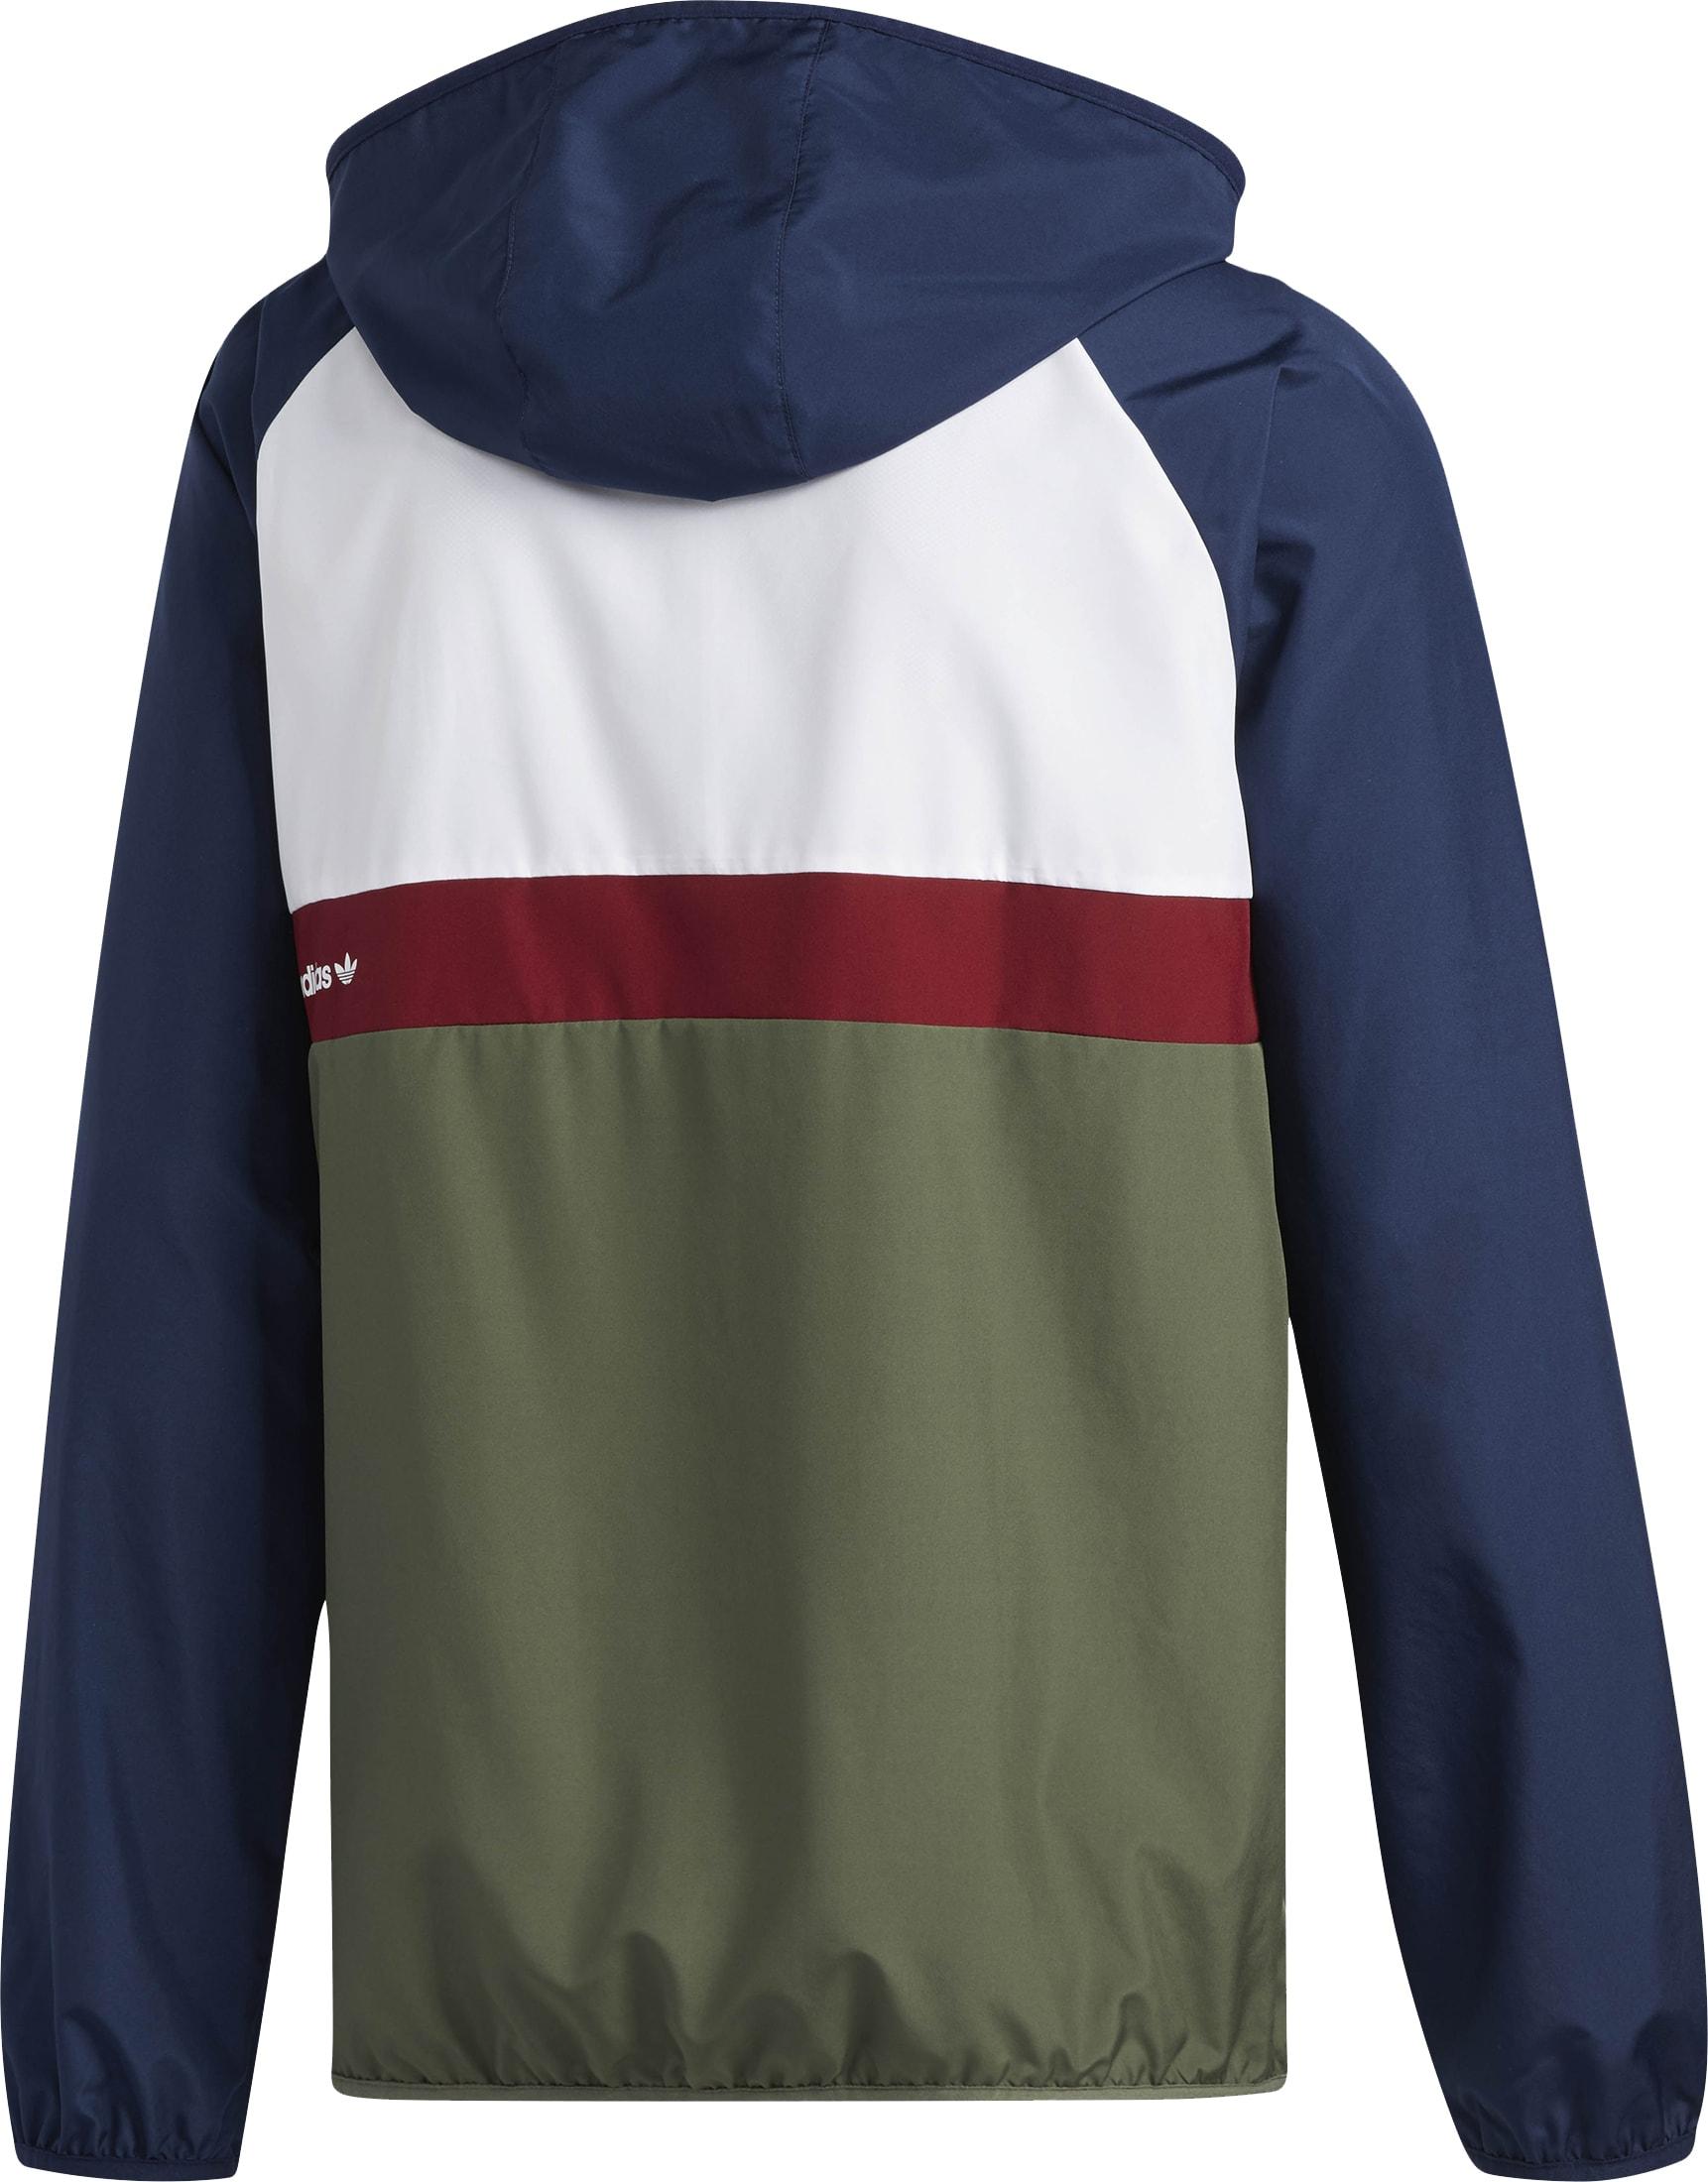 aa2cd964c4e adidas-bb-packable-wind-jacket-collegiate-navy-white-base-green-19-1.jpg